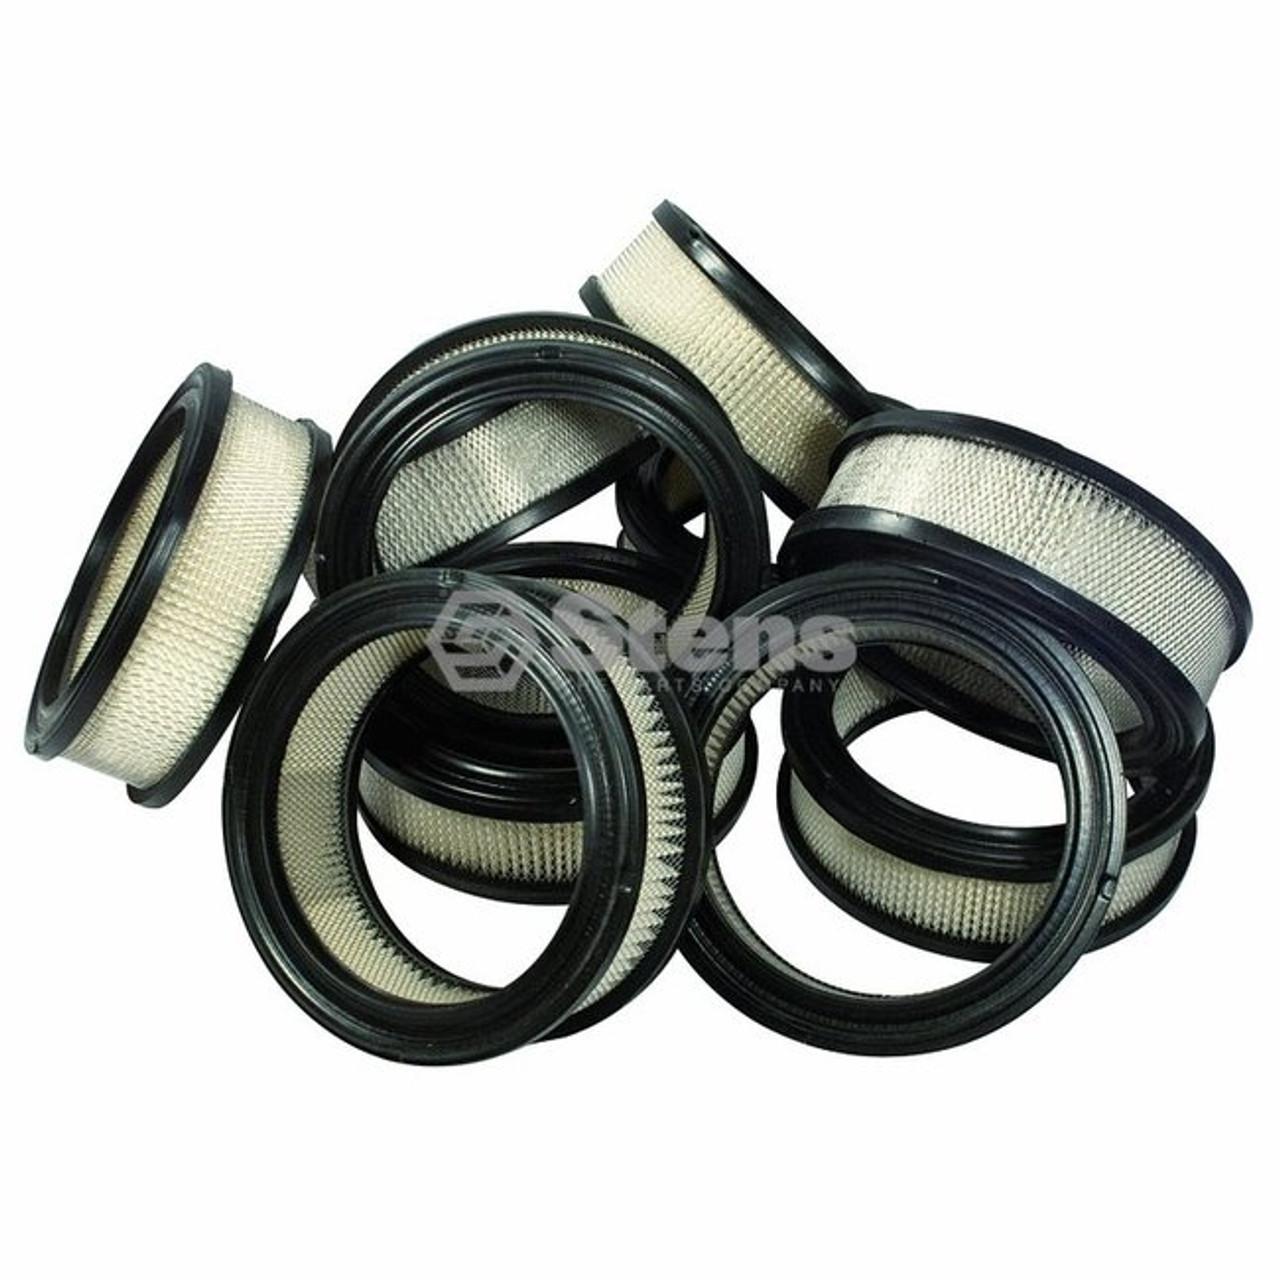 Air Filter for Tecumseh 32008 Shop Pack of 10 Air Filters